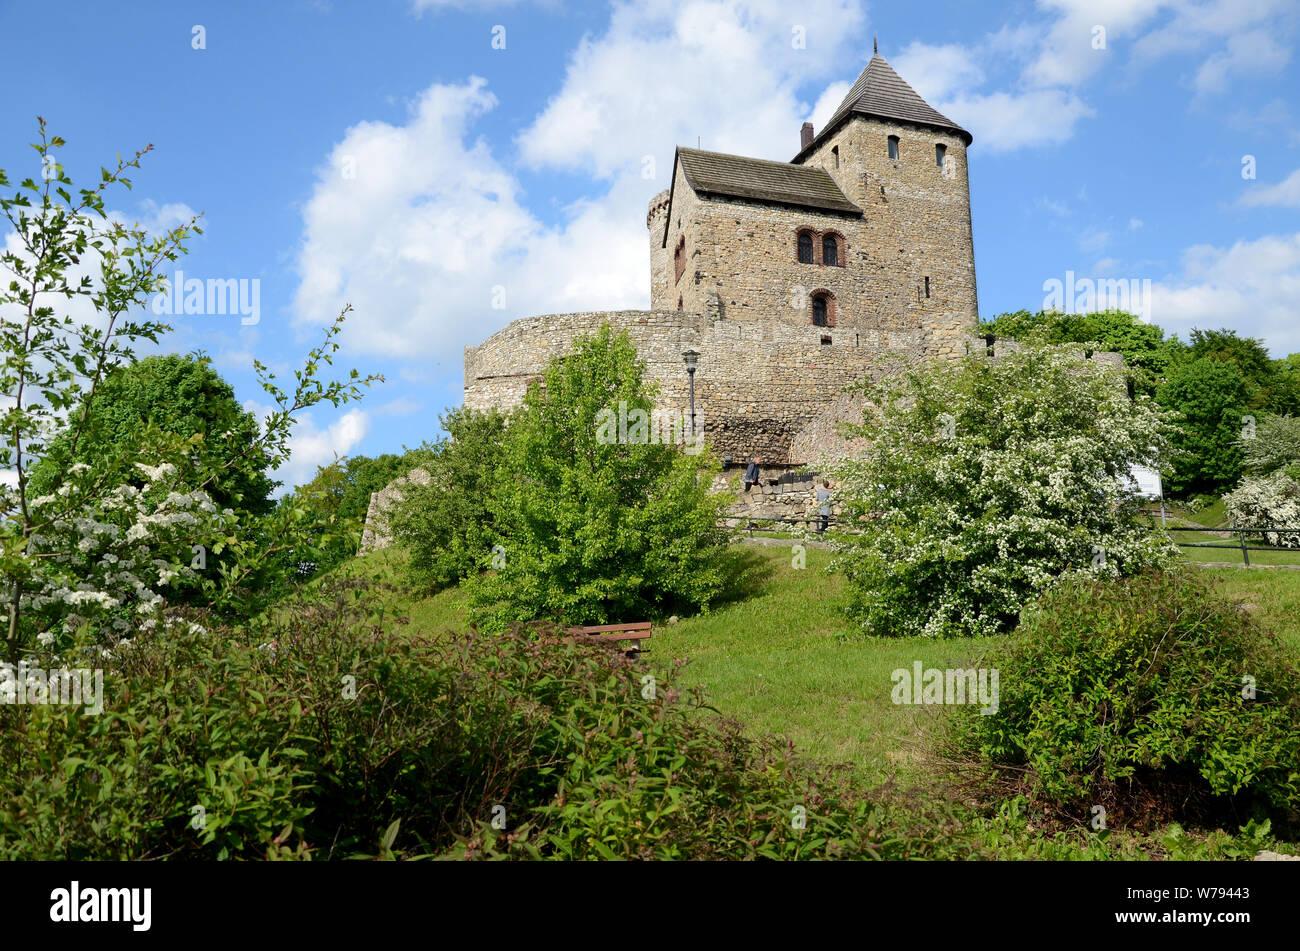 Old gothic castle (Bedzin in Poland) Stock Photo